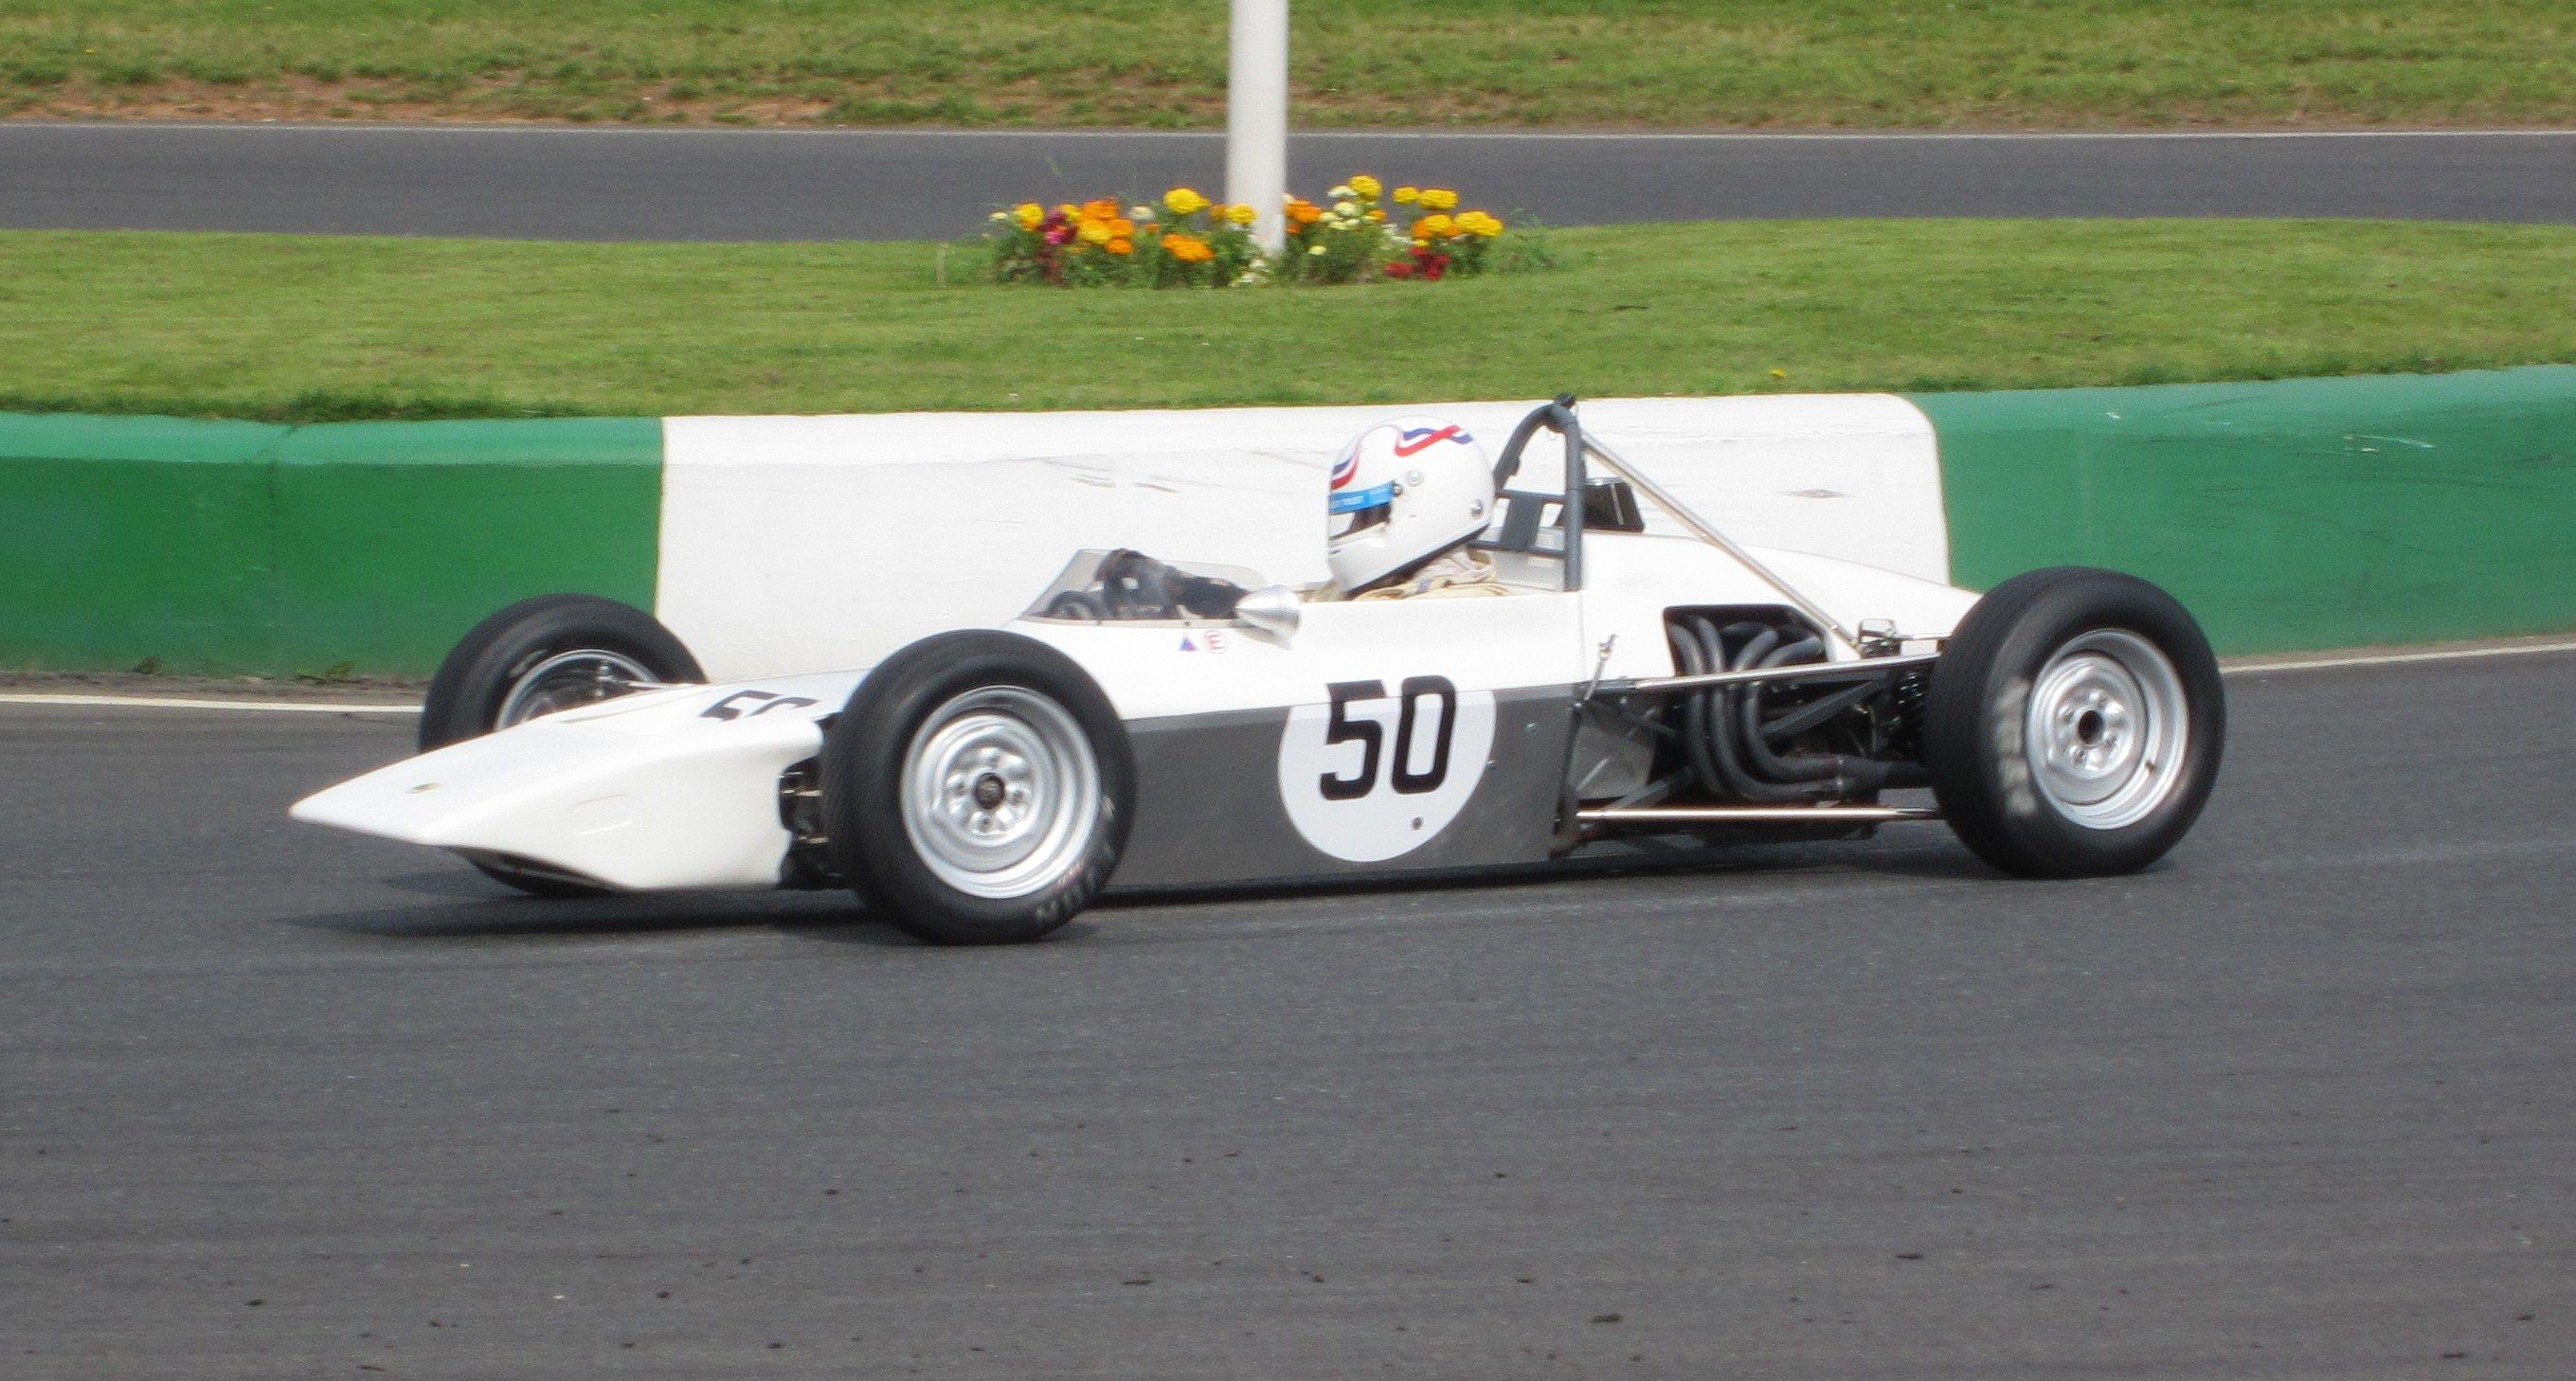 Lotus 69 (COM) | Formula Cars | Pinterest | Lotus, Ford and Dream cars